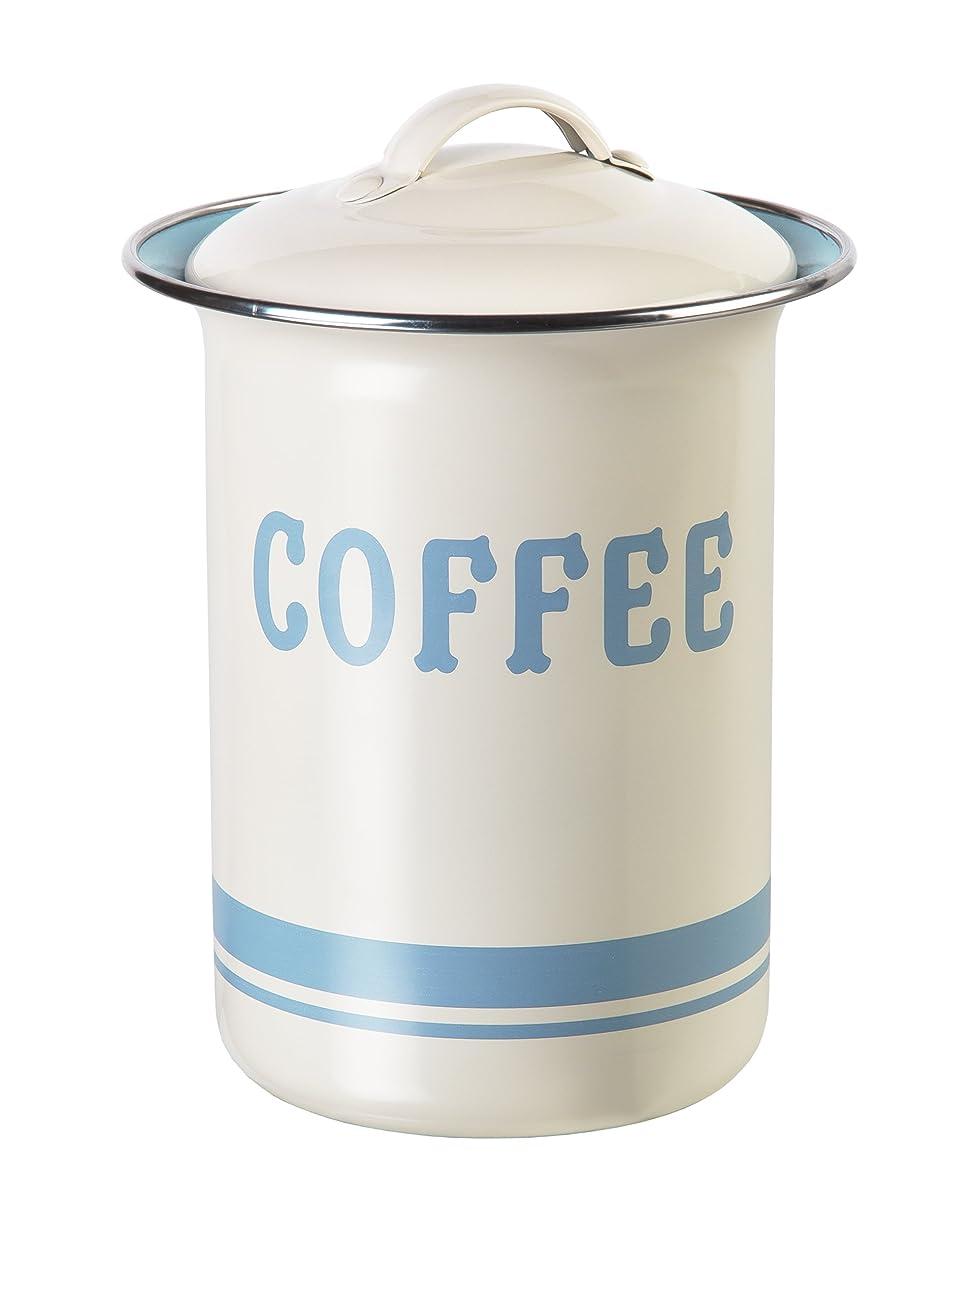 JAMIE OLIVER Vintage Inspired Coffee, Tea and Sugar Tin Set 4